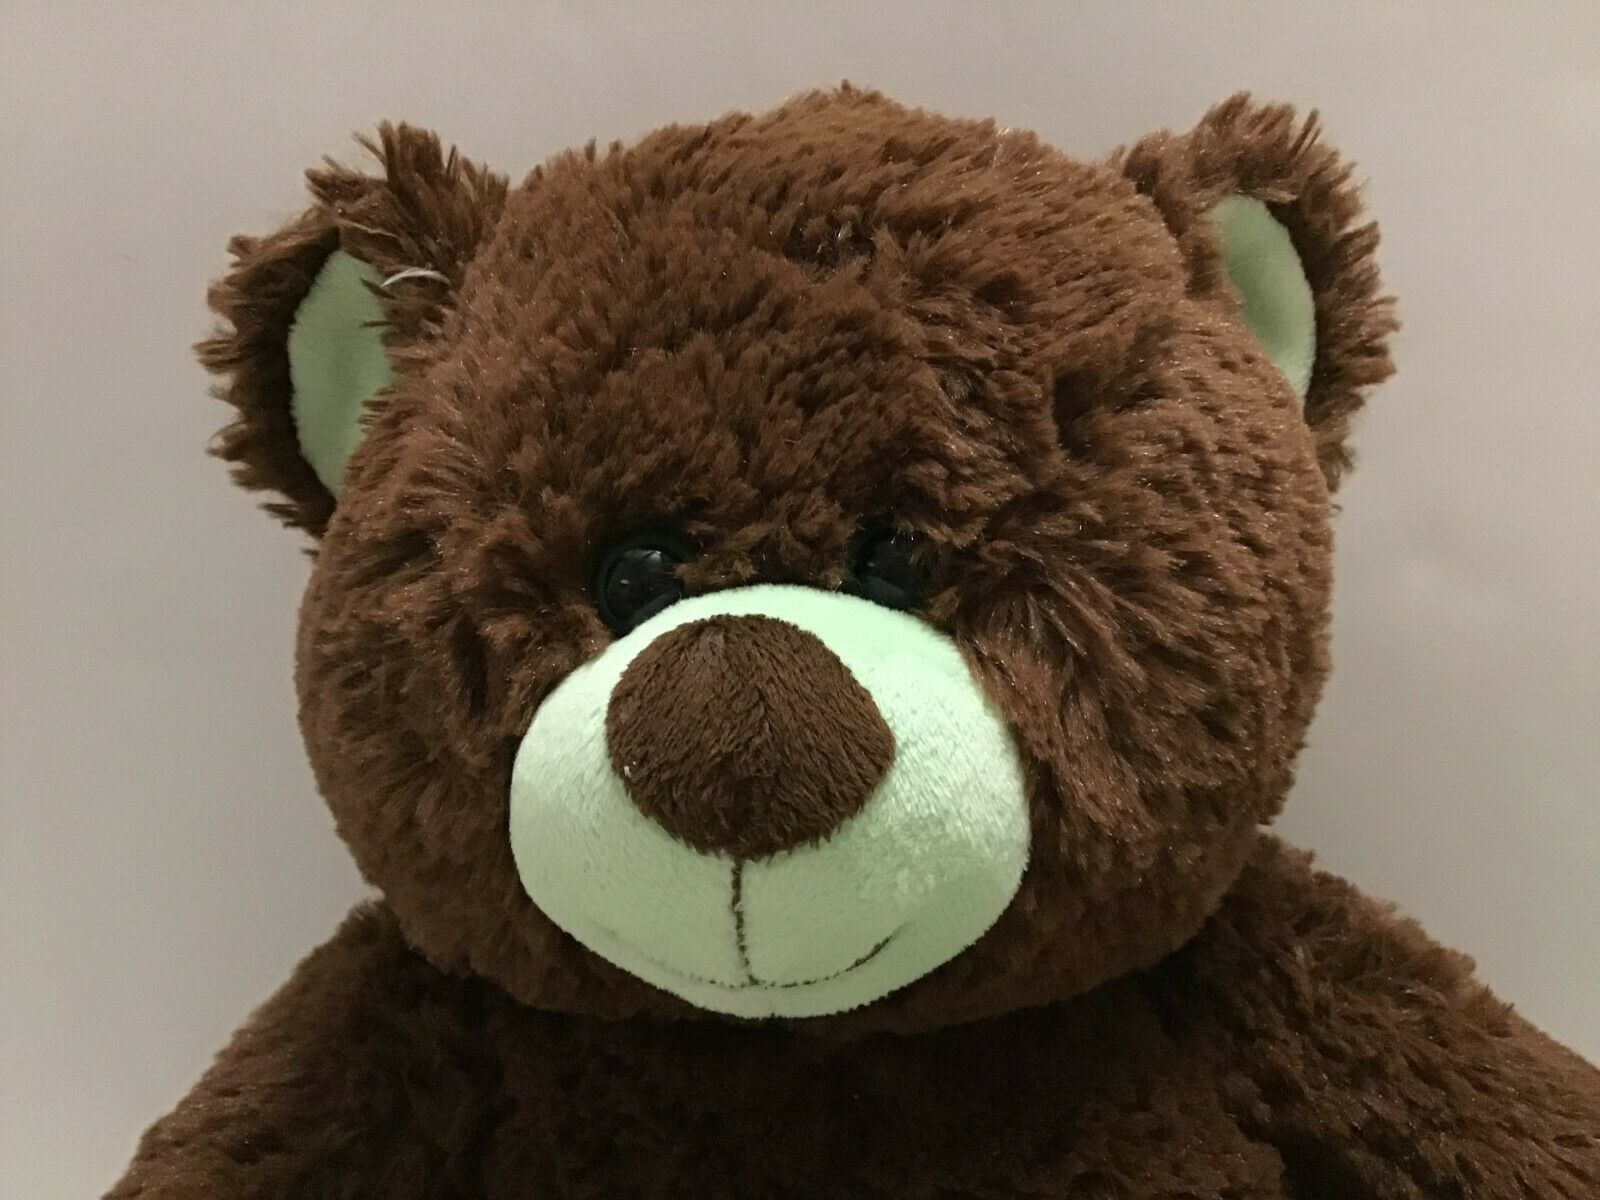 Build A Bear Girl Scout Cookies Thin Mints Plush Bear 14 Inch BABW Teddy